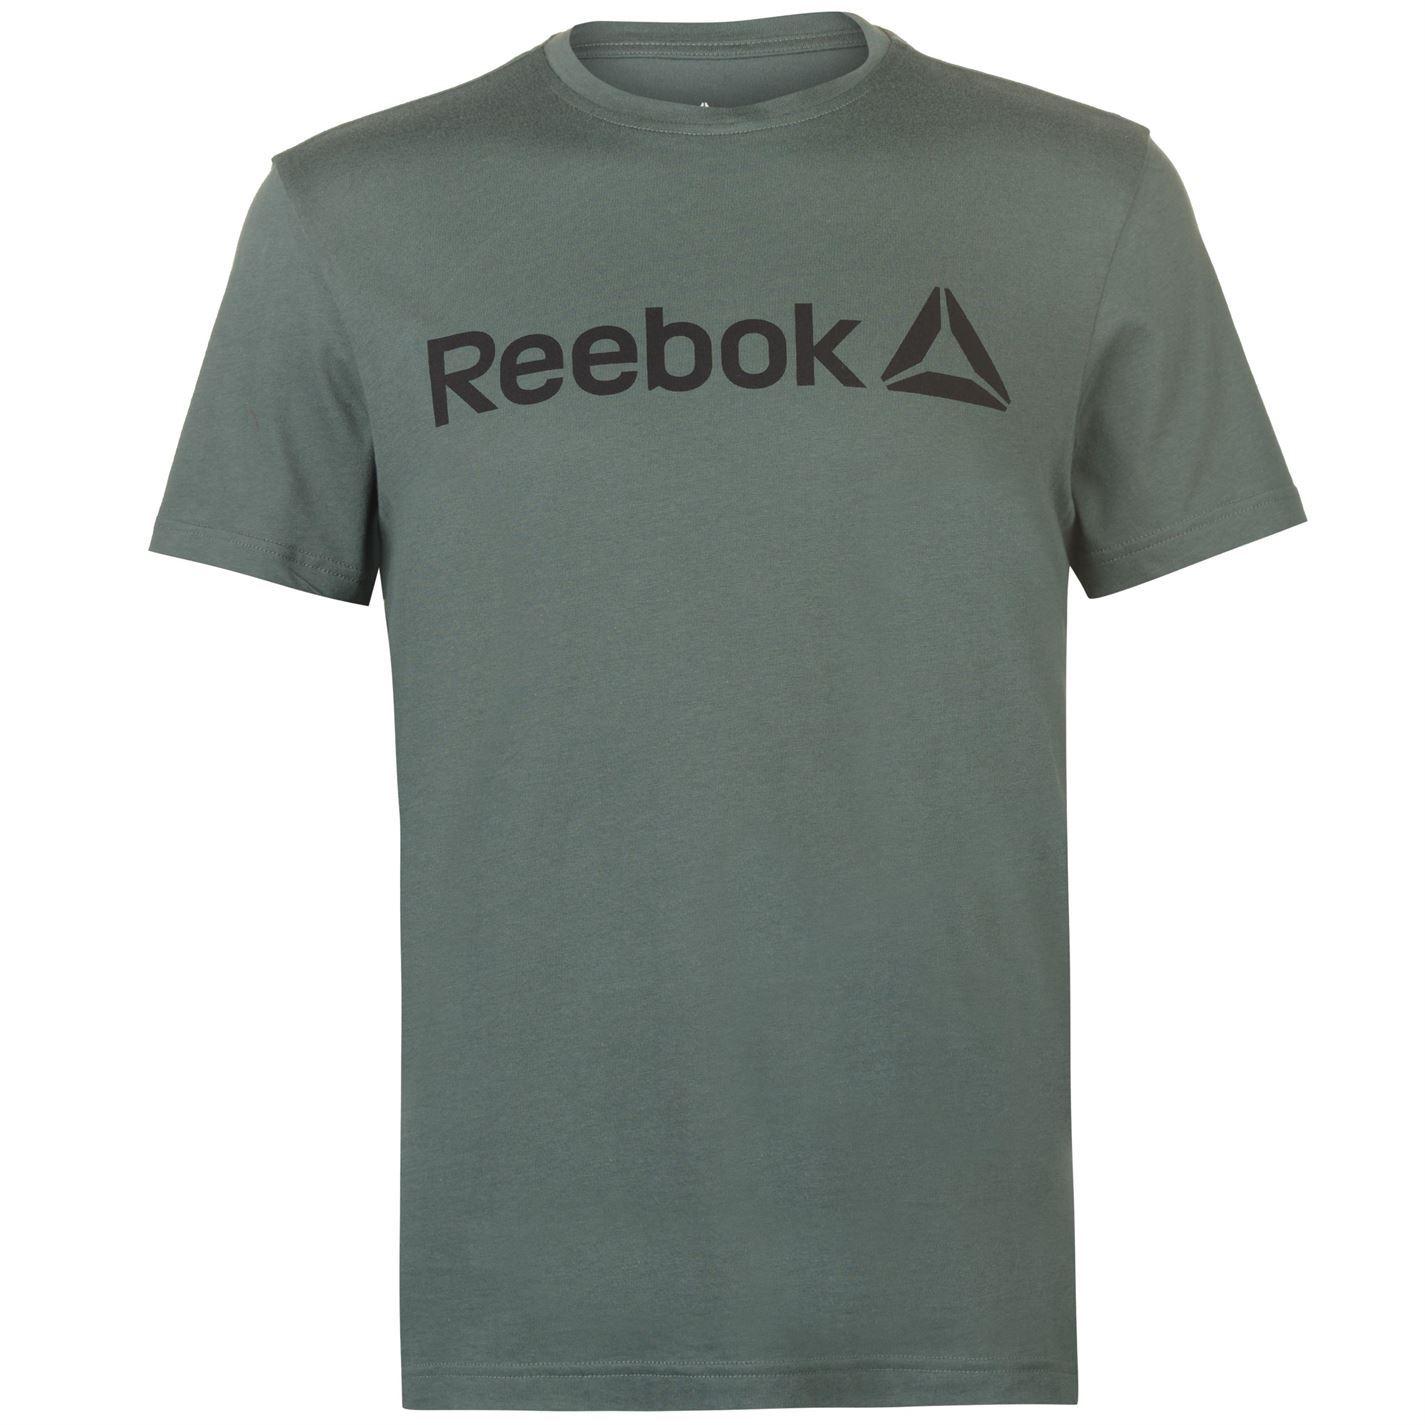 Reebok-Delta-Logo-T-Shirt-Mens-Tee-Shirt-Top thumbnail 21